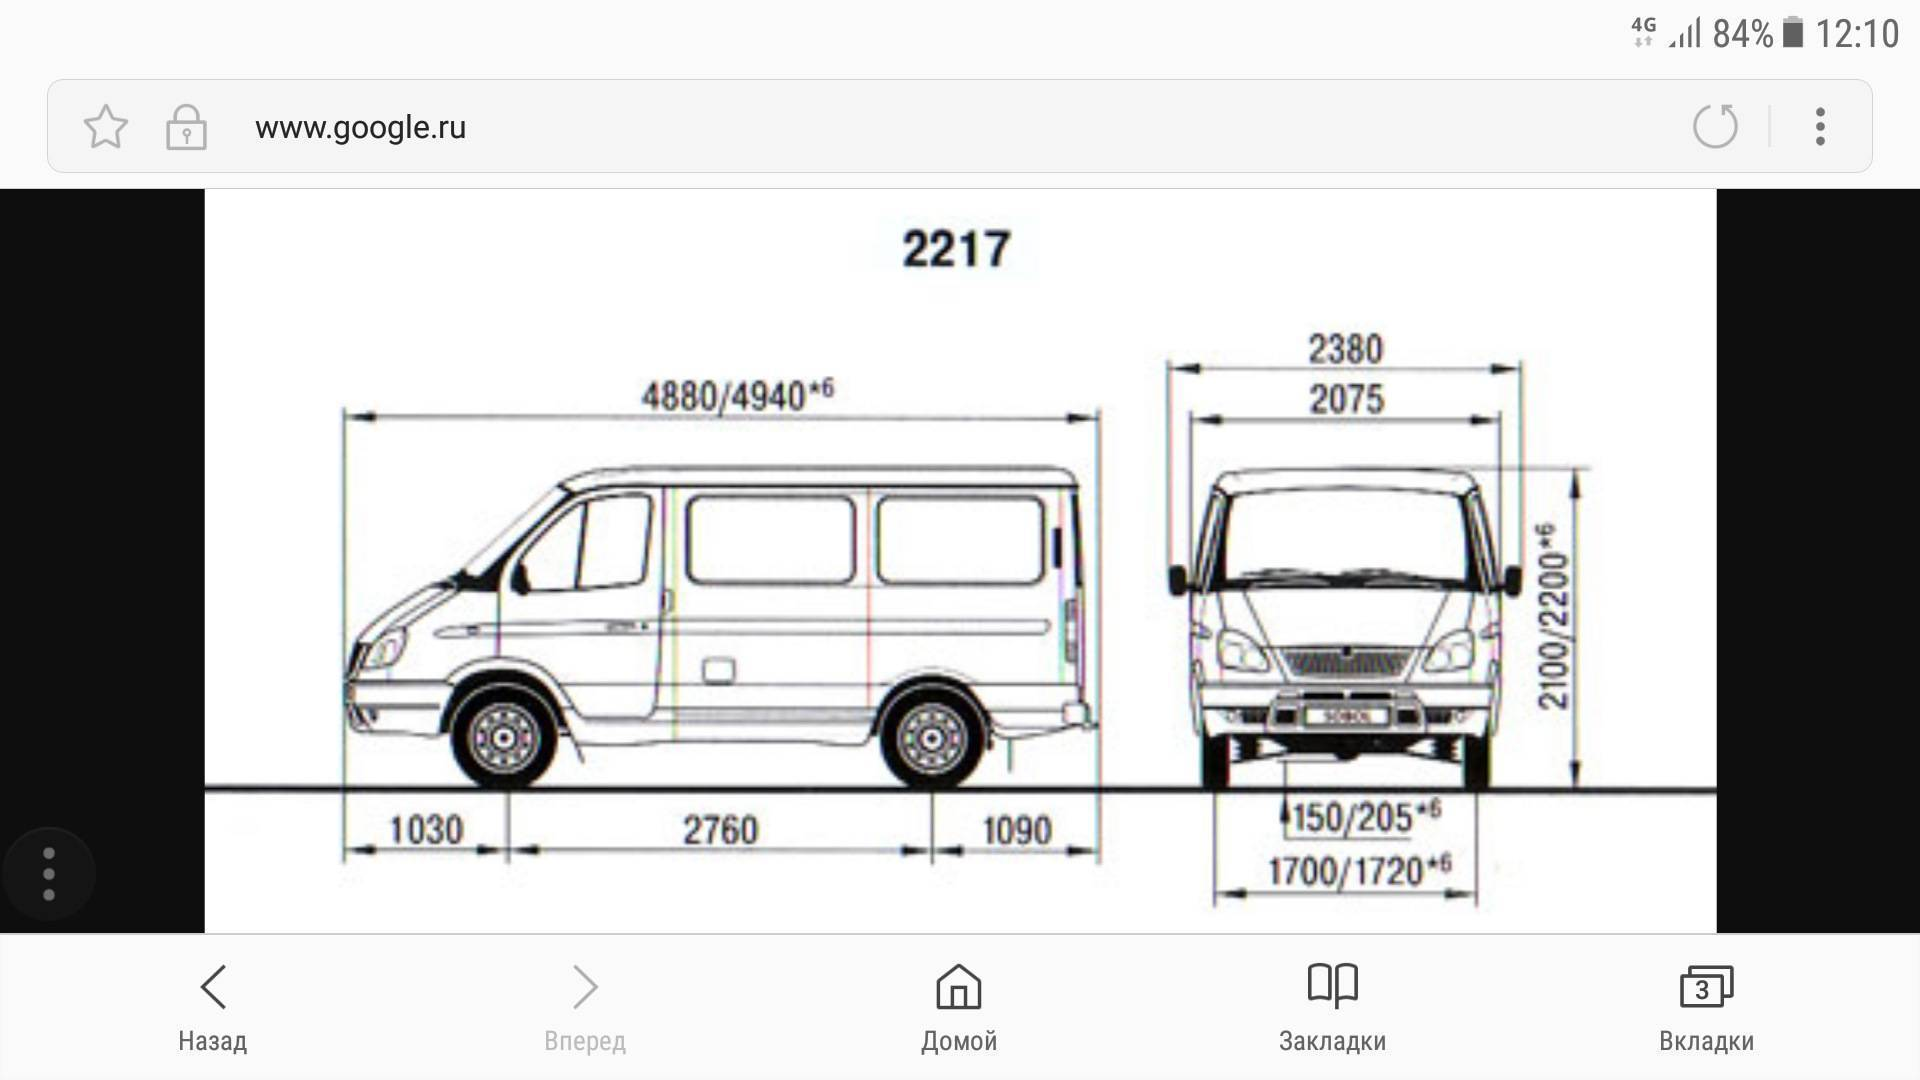 Газ 22171: цена газ 22171, технические характеристики газ 22171, фото, отзывы, видео - avto-russia.ru